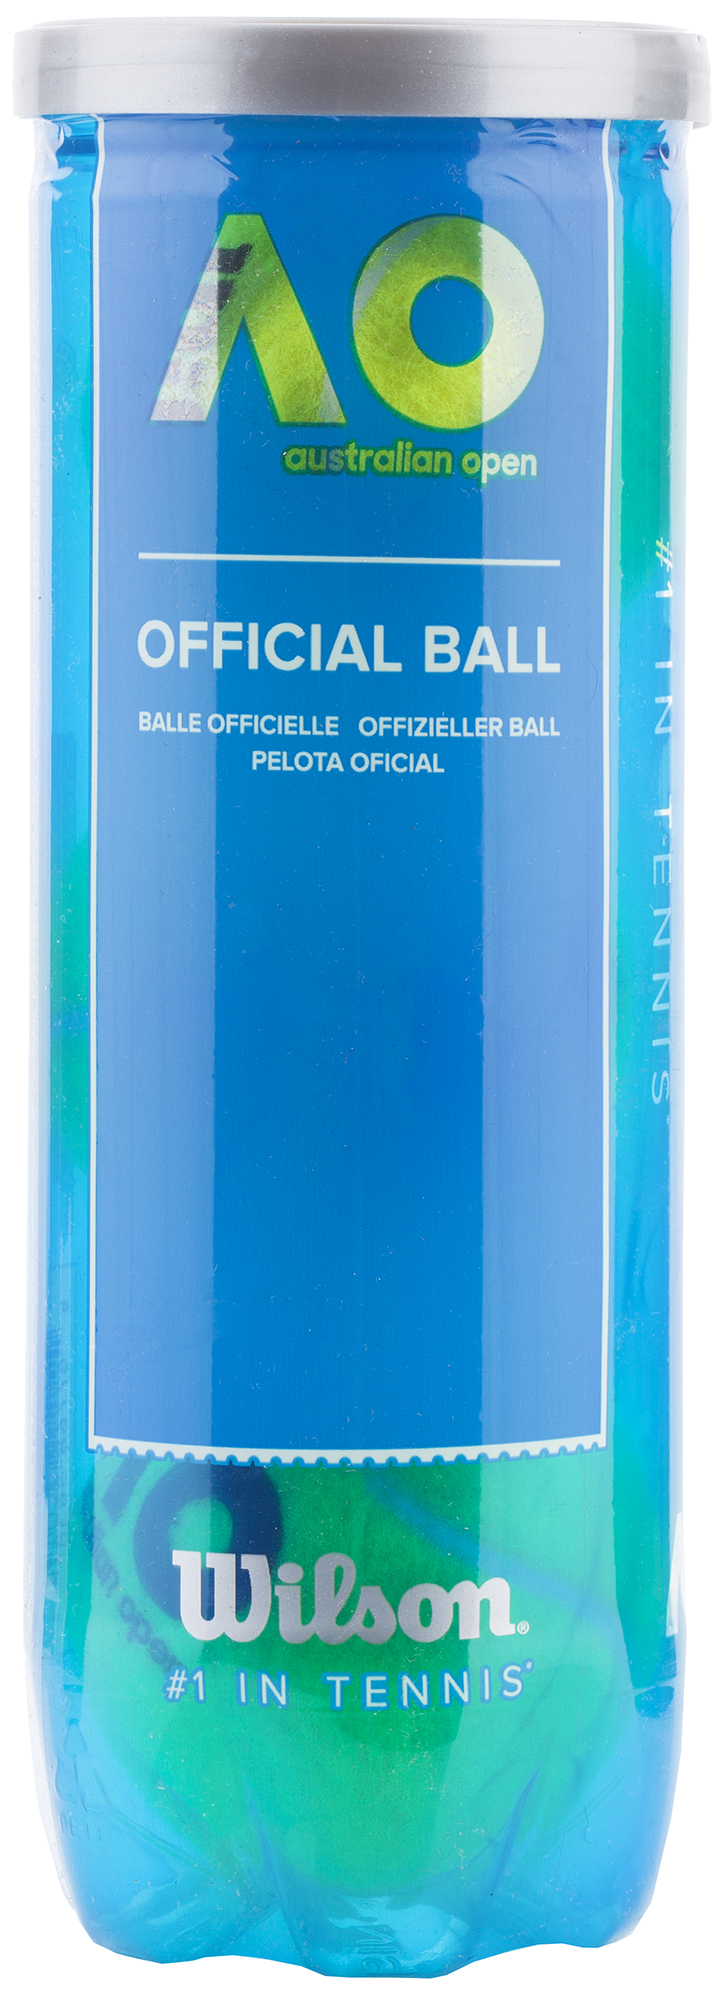 Wilson Набор мячей для большого тенниса Wilson AUSTRALIAN OPEN 3 BALL CAN, размер Без размера wilson набор мячей для большого тенниса wilson us open x3 размер без размера